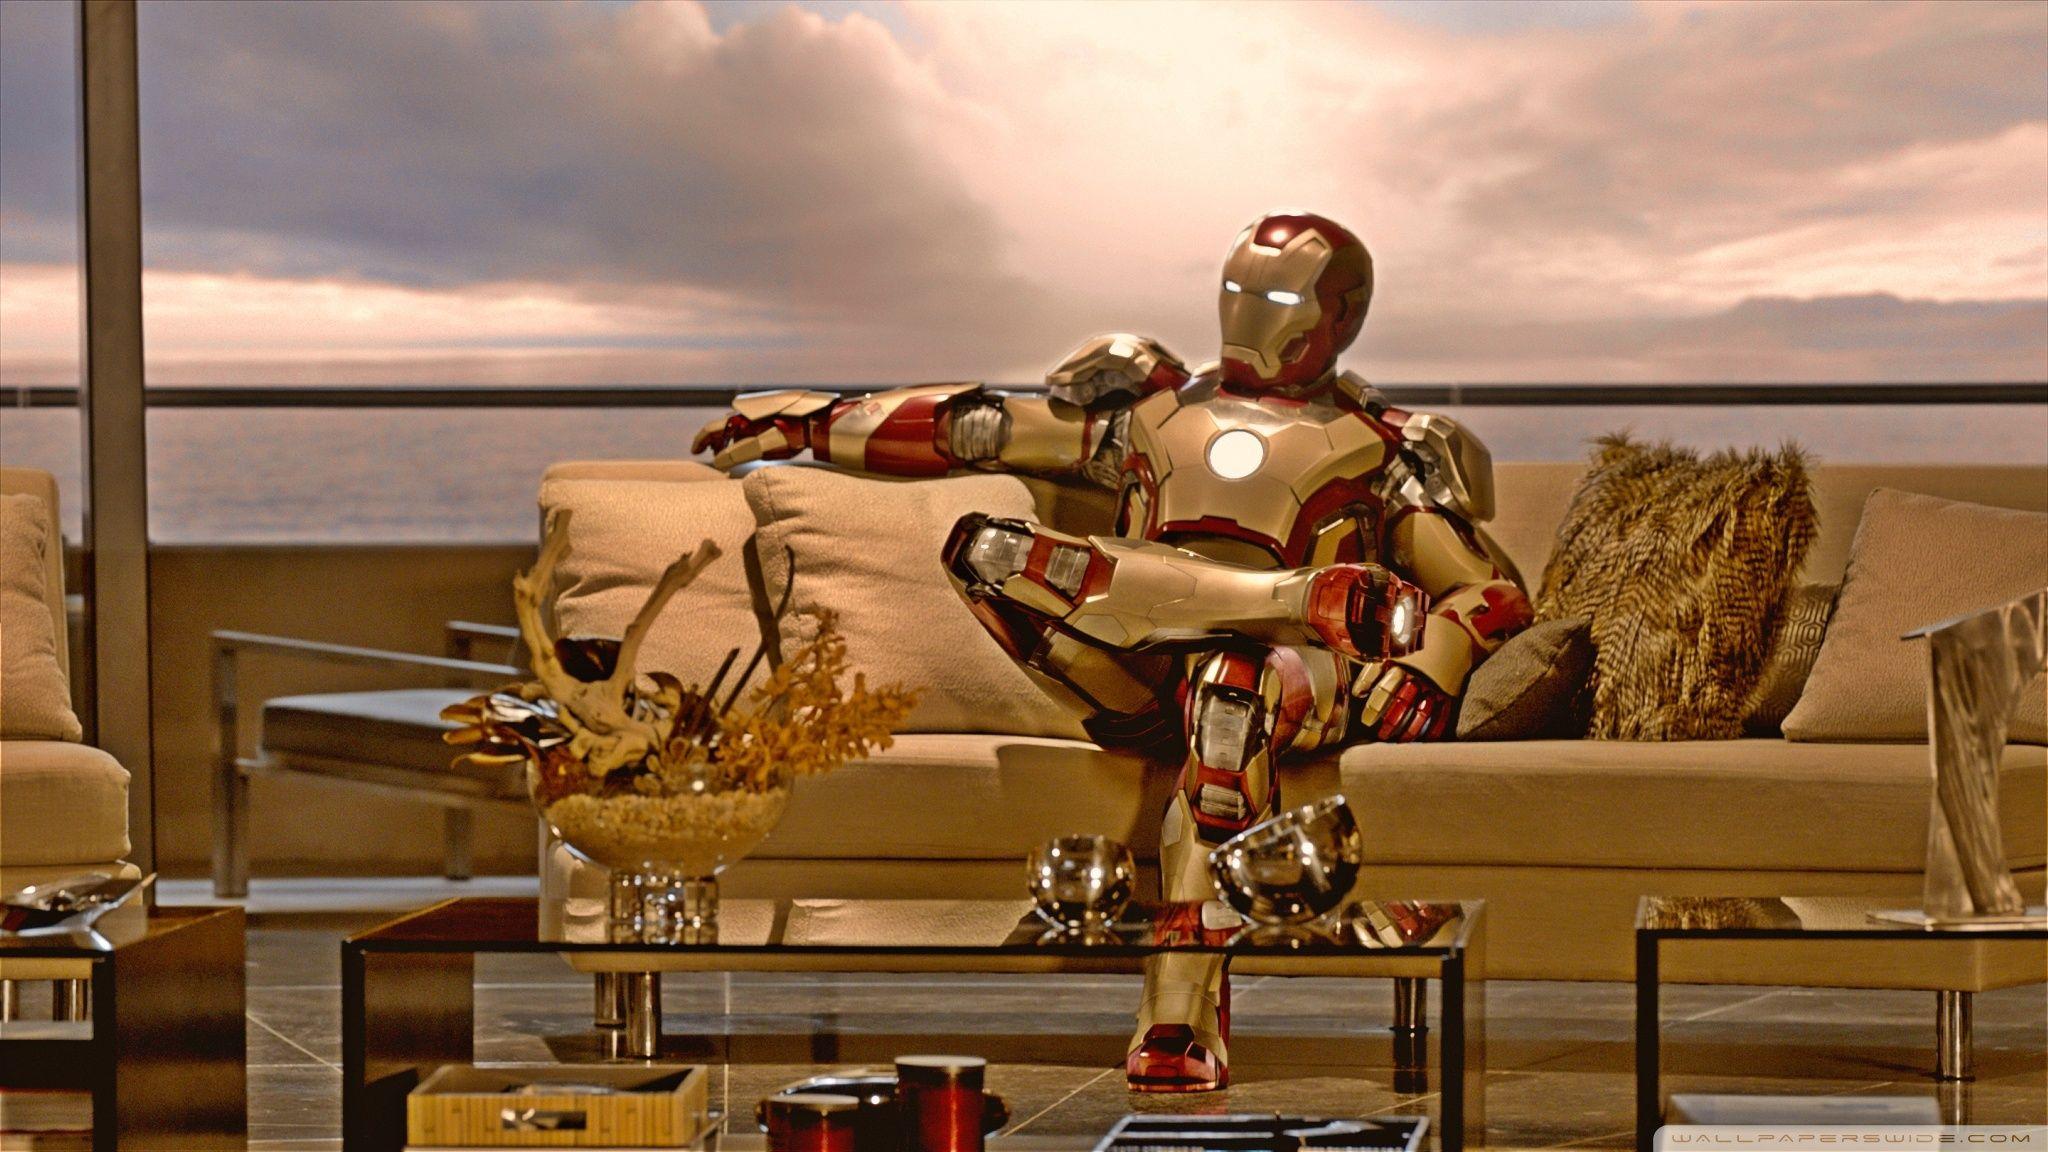 free download iron man full hd wallpapers free download wallpaper